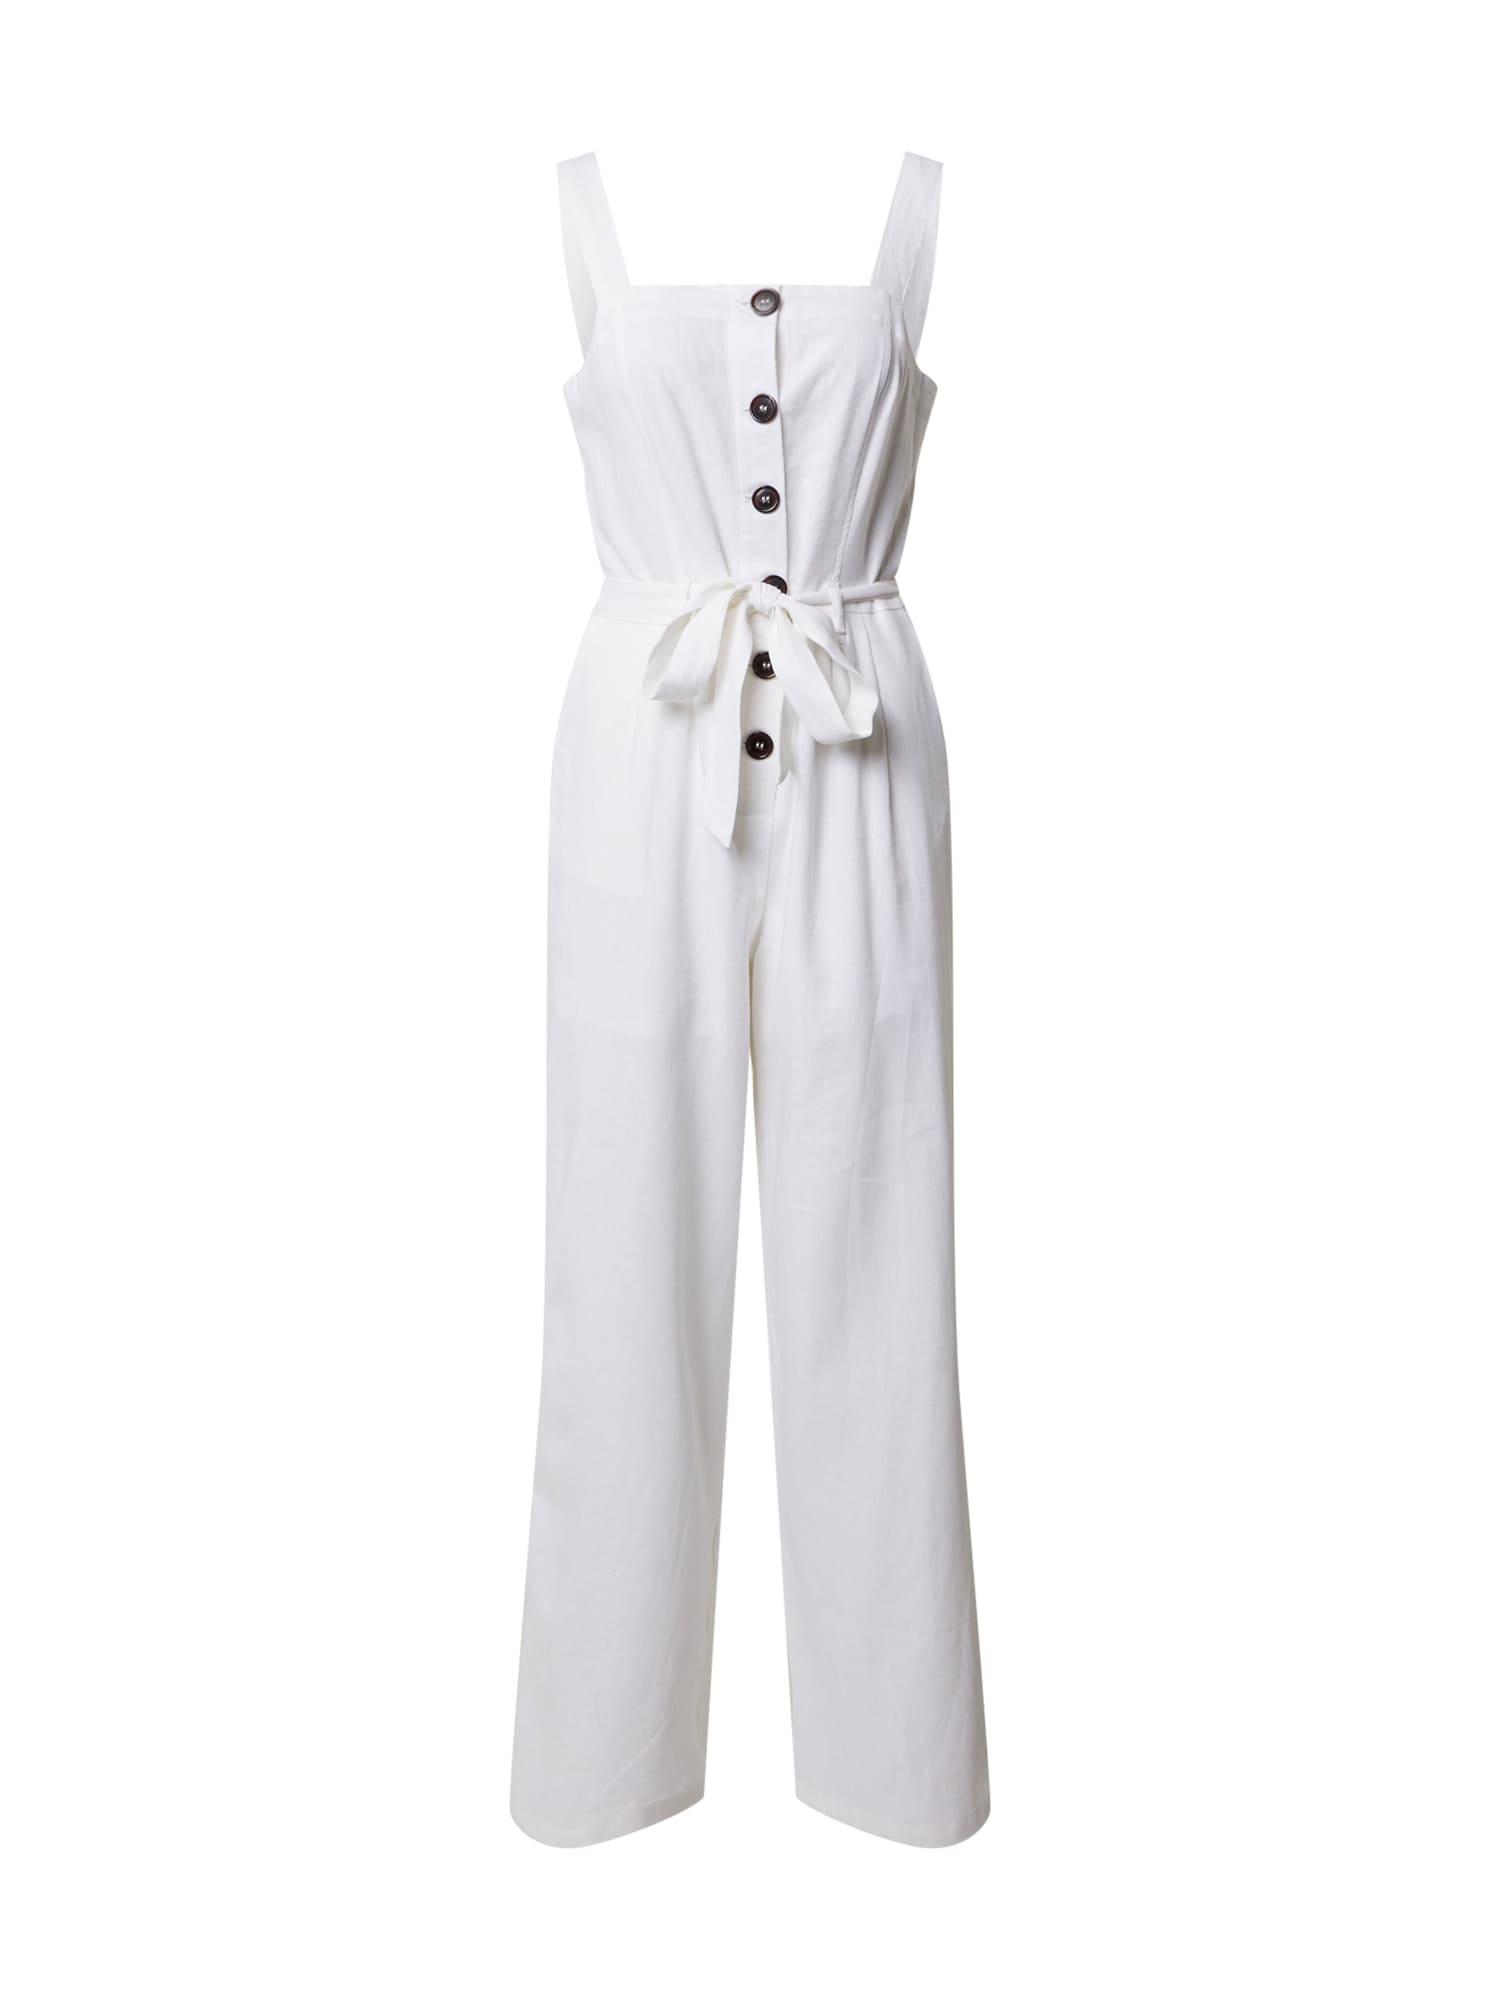 Dorothy Perkins Vienos dalies kostiumas balta